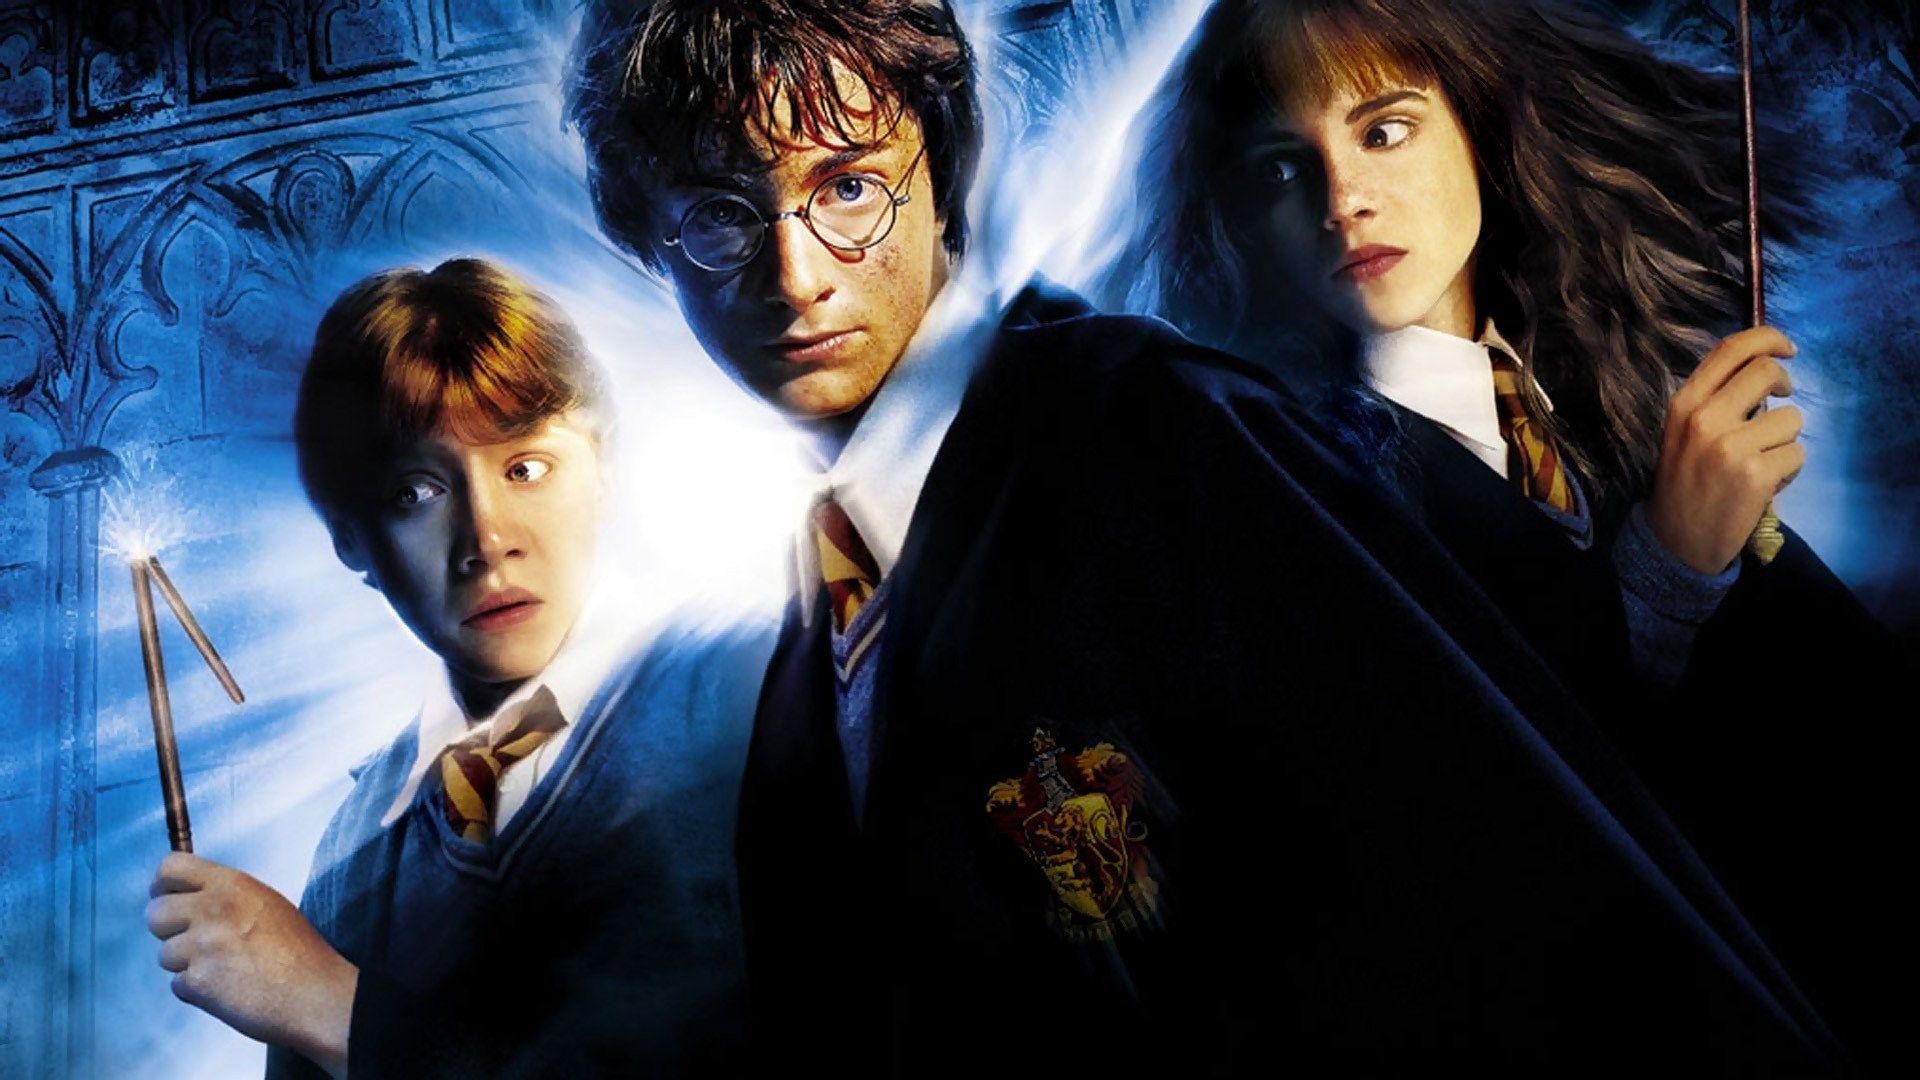 Harry Potter And The Chamber Of Secrets 1080p High Quality 1920x1080 Kammer Des Schreckens Ganze Filme Filme Stream